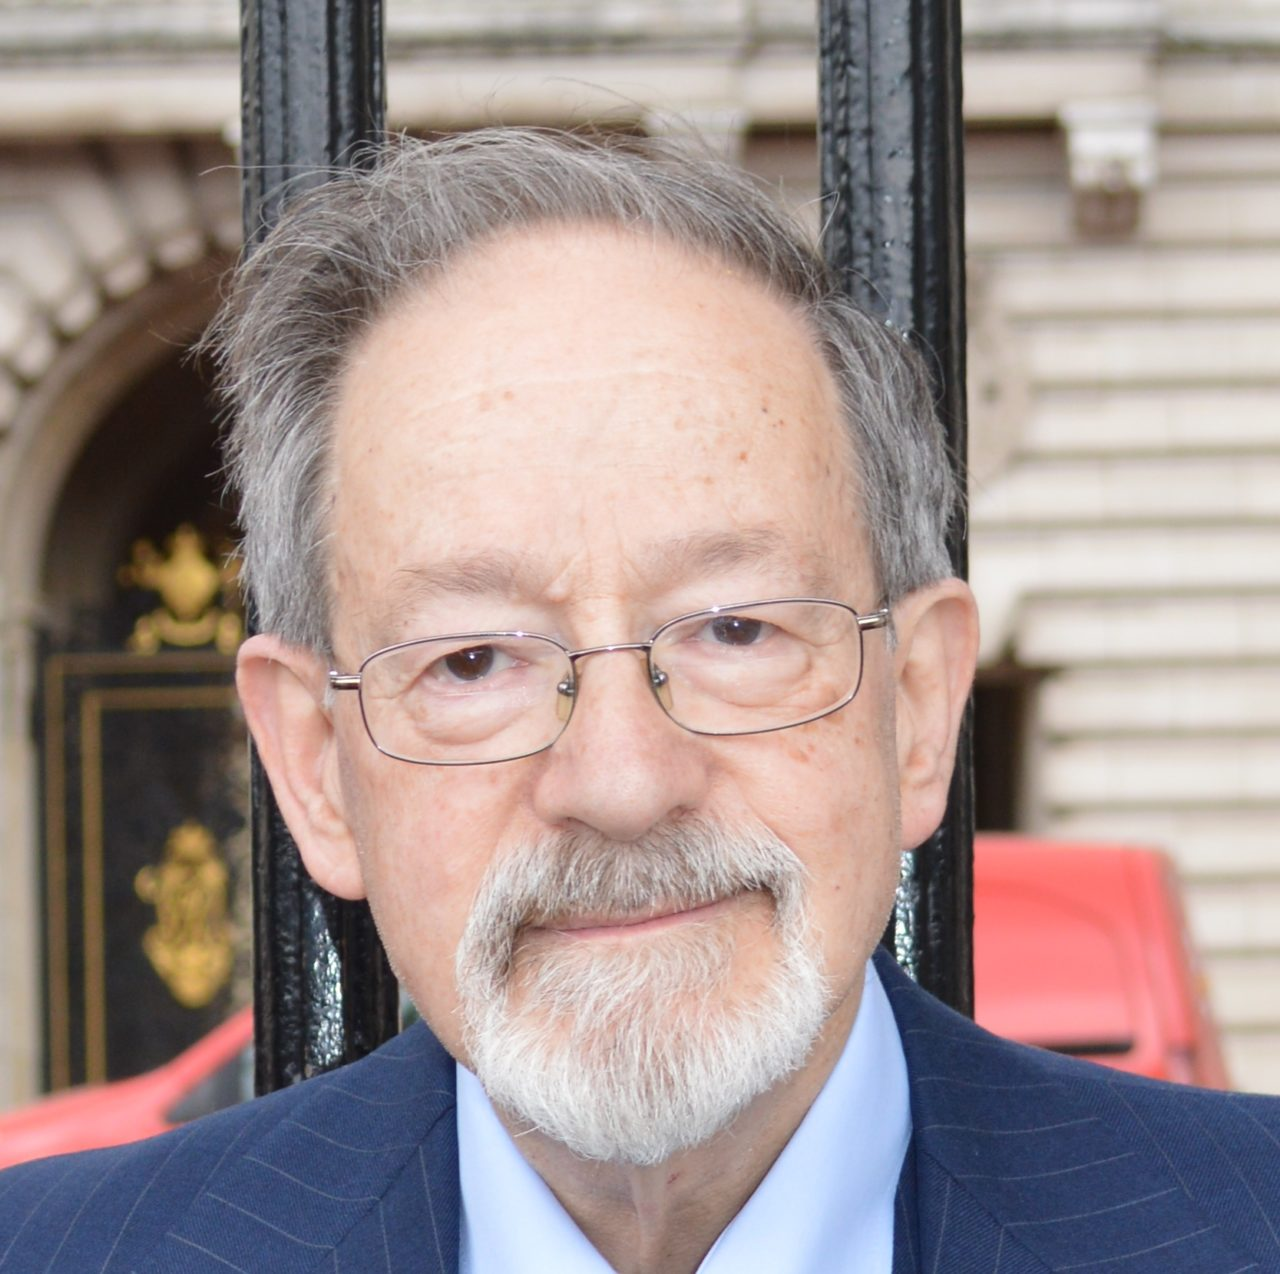 Martin Stern MBE